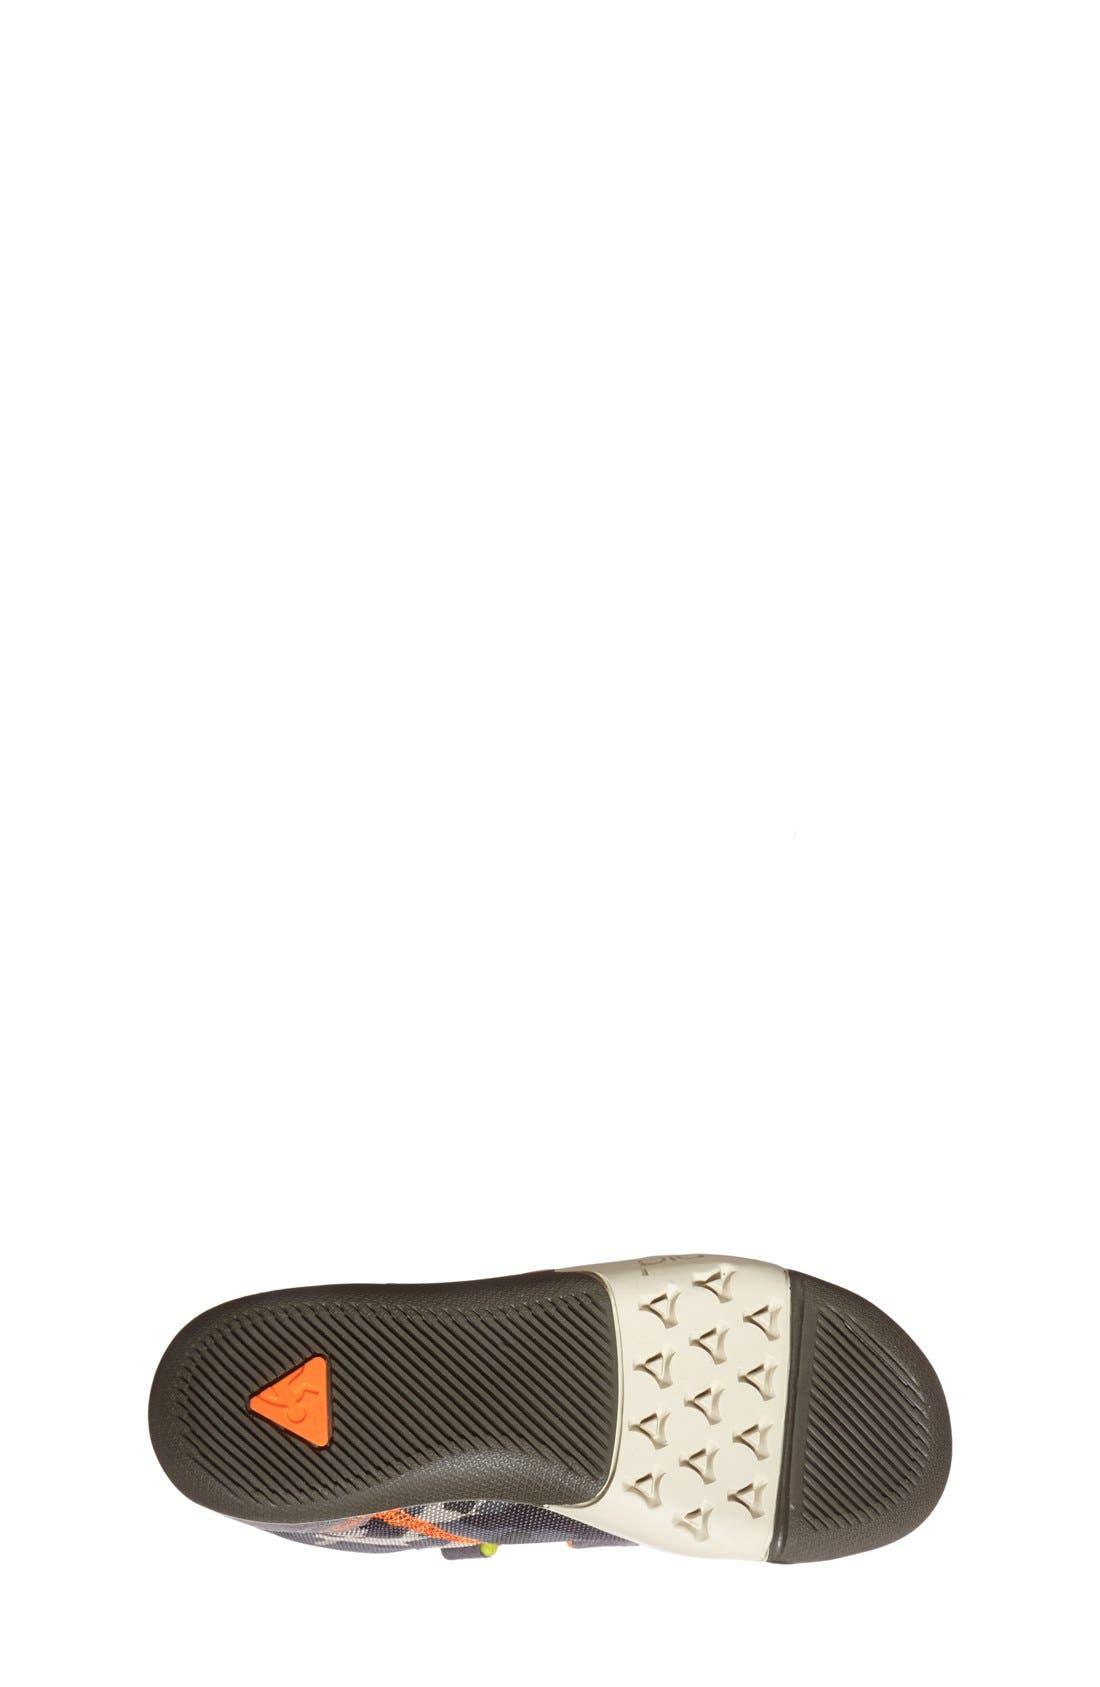 'Max' Customizable High Top Sneaker,                             Alternate thumbnail 4, color,                             054